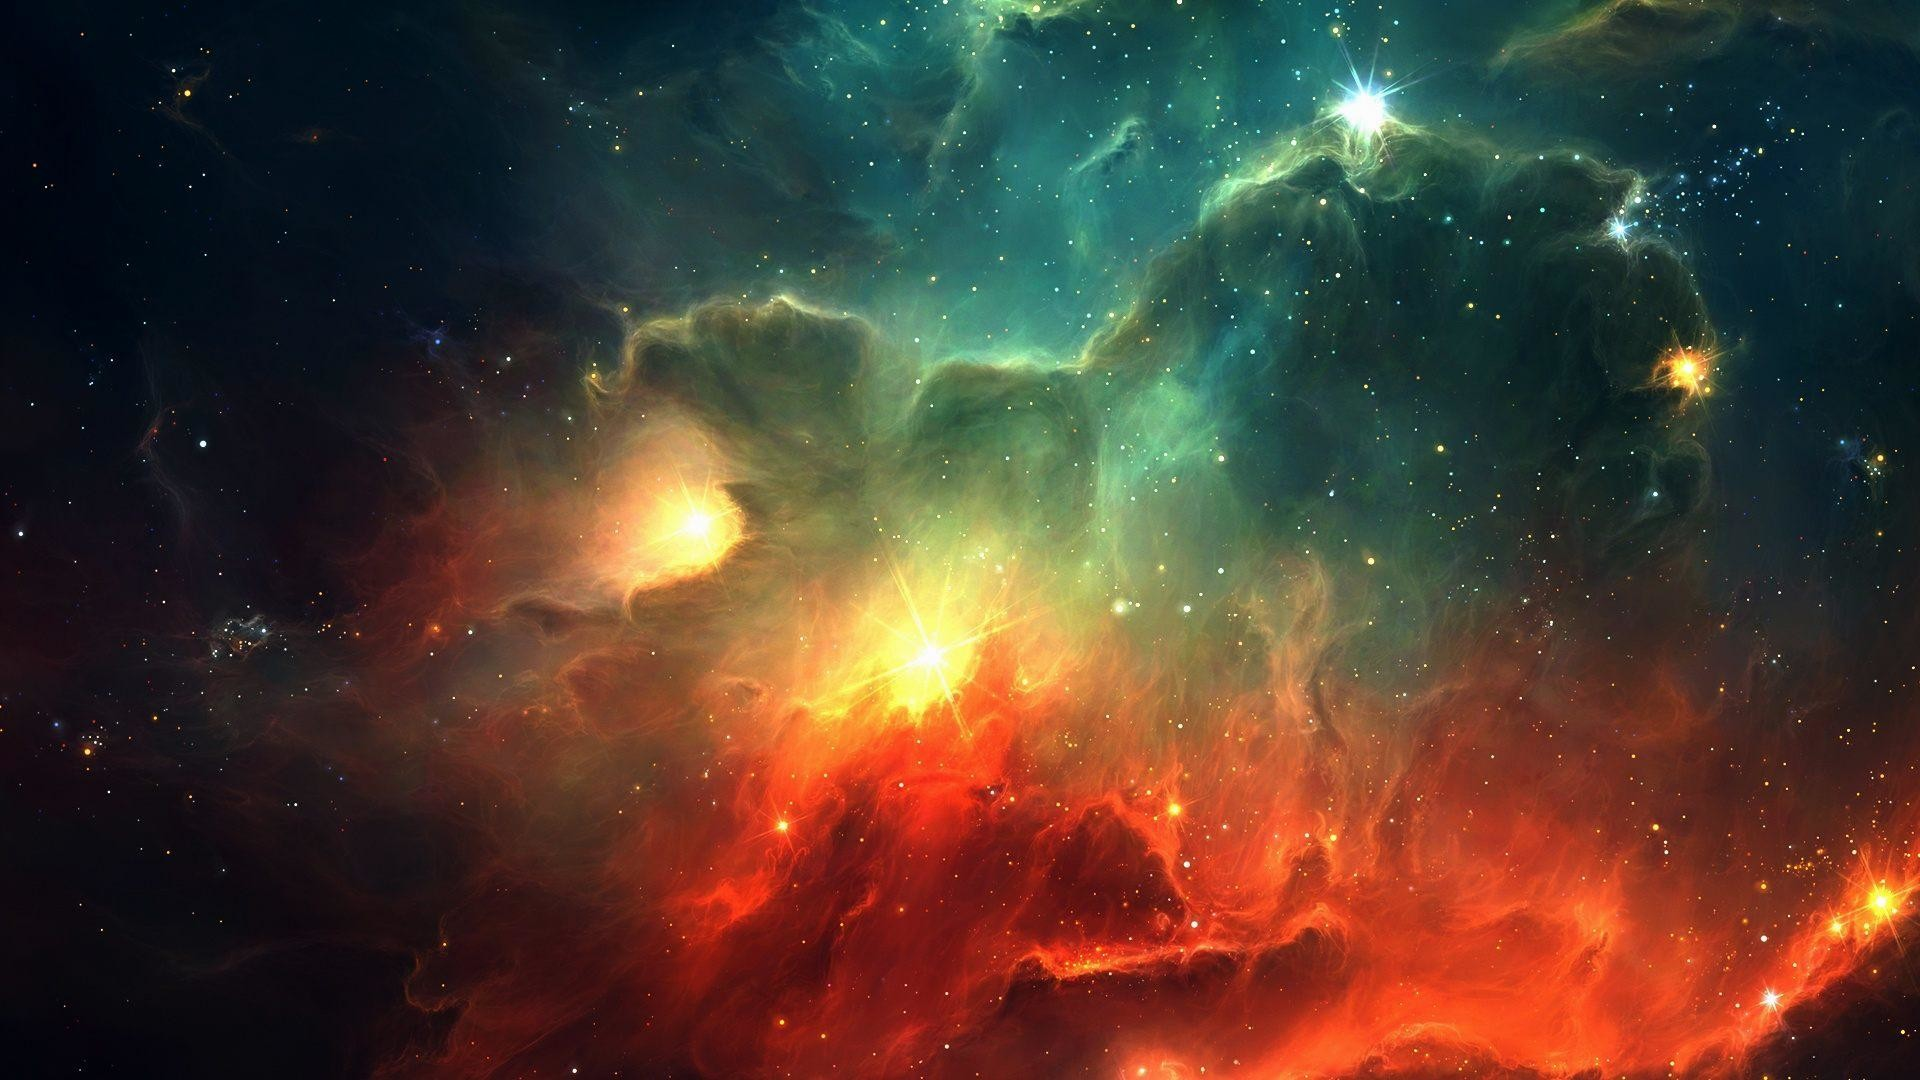 wallpaper.wiki-Starfield-universe-wallpaper-PIC-WPD00404